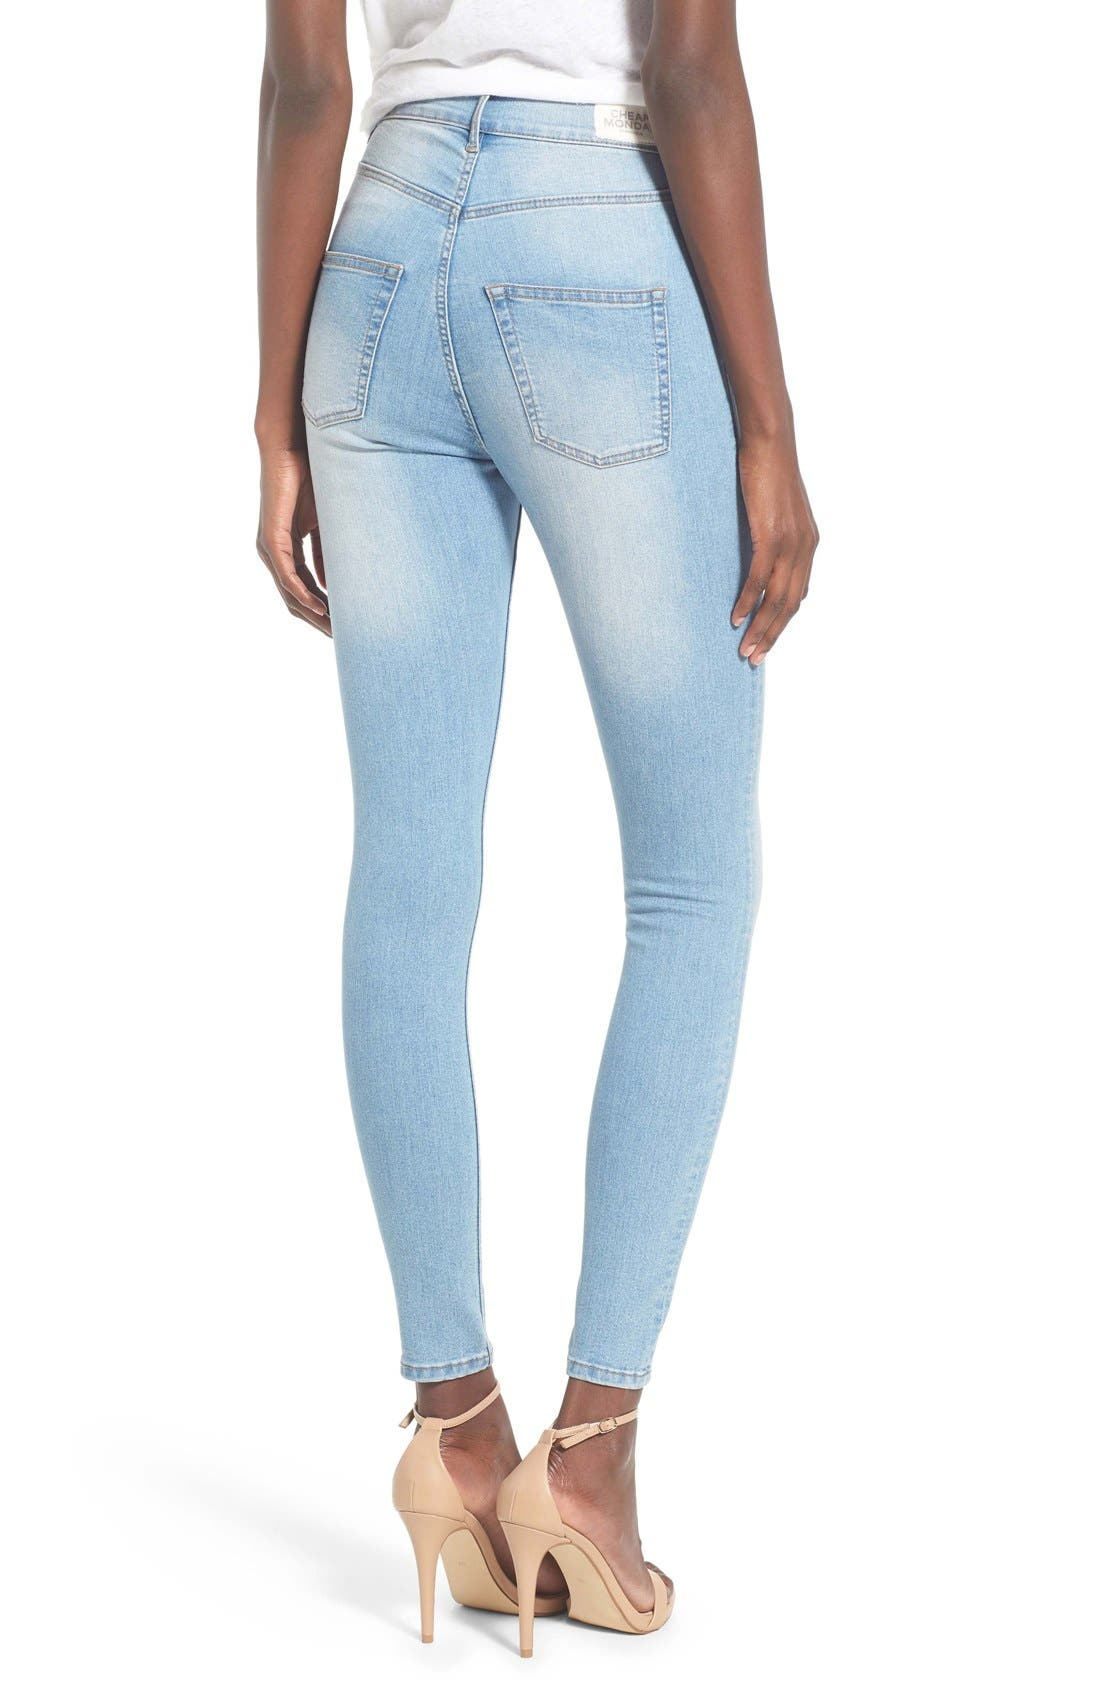 Alternate Image 2  - Cheap Monday 'High Spray' High Rise Skinny Jeans (Stone Bleach)